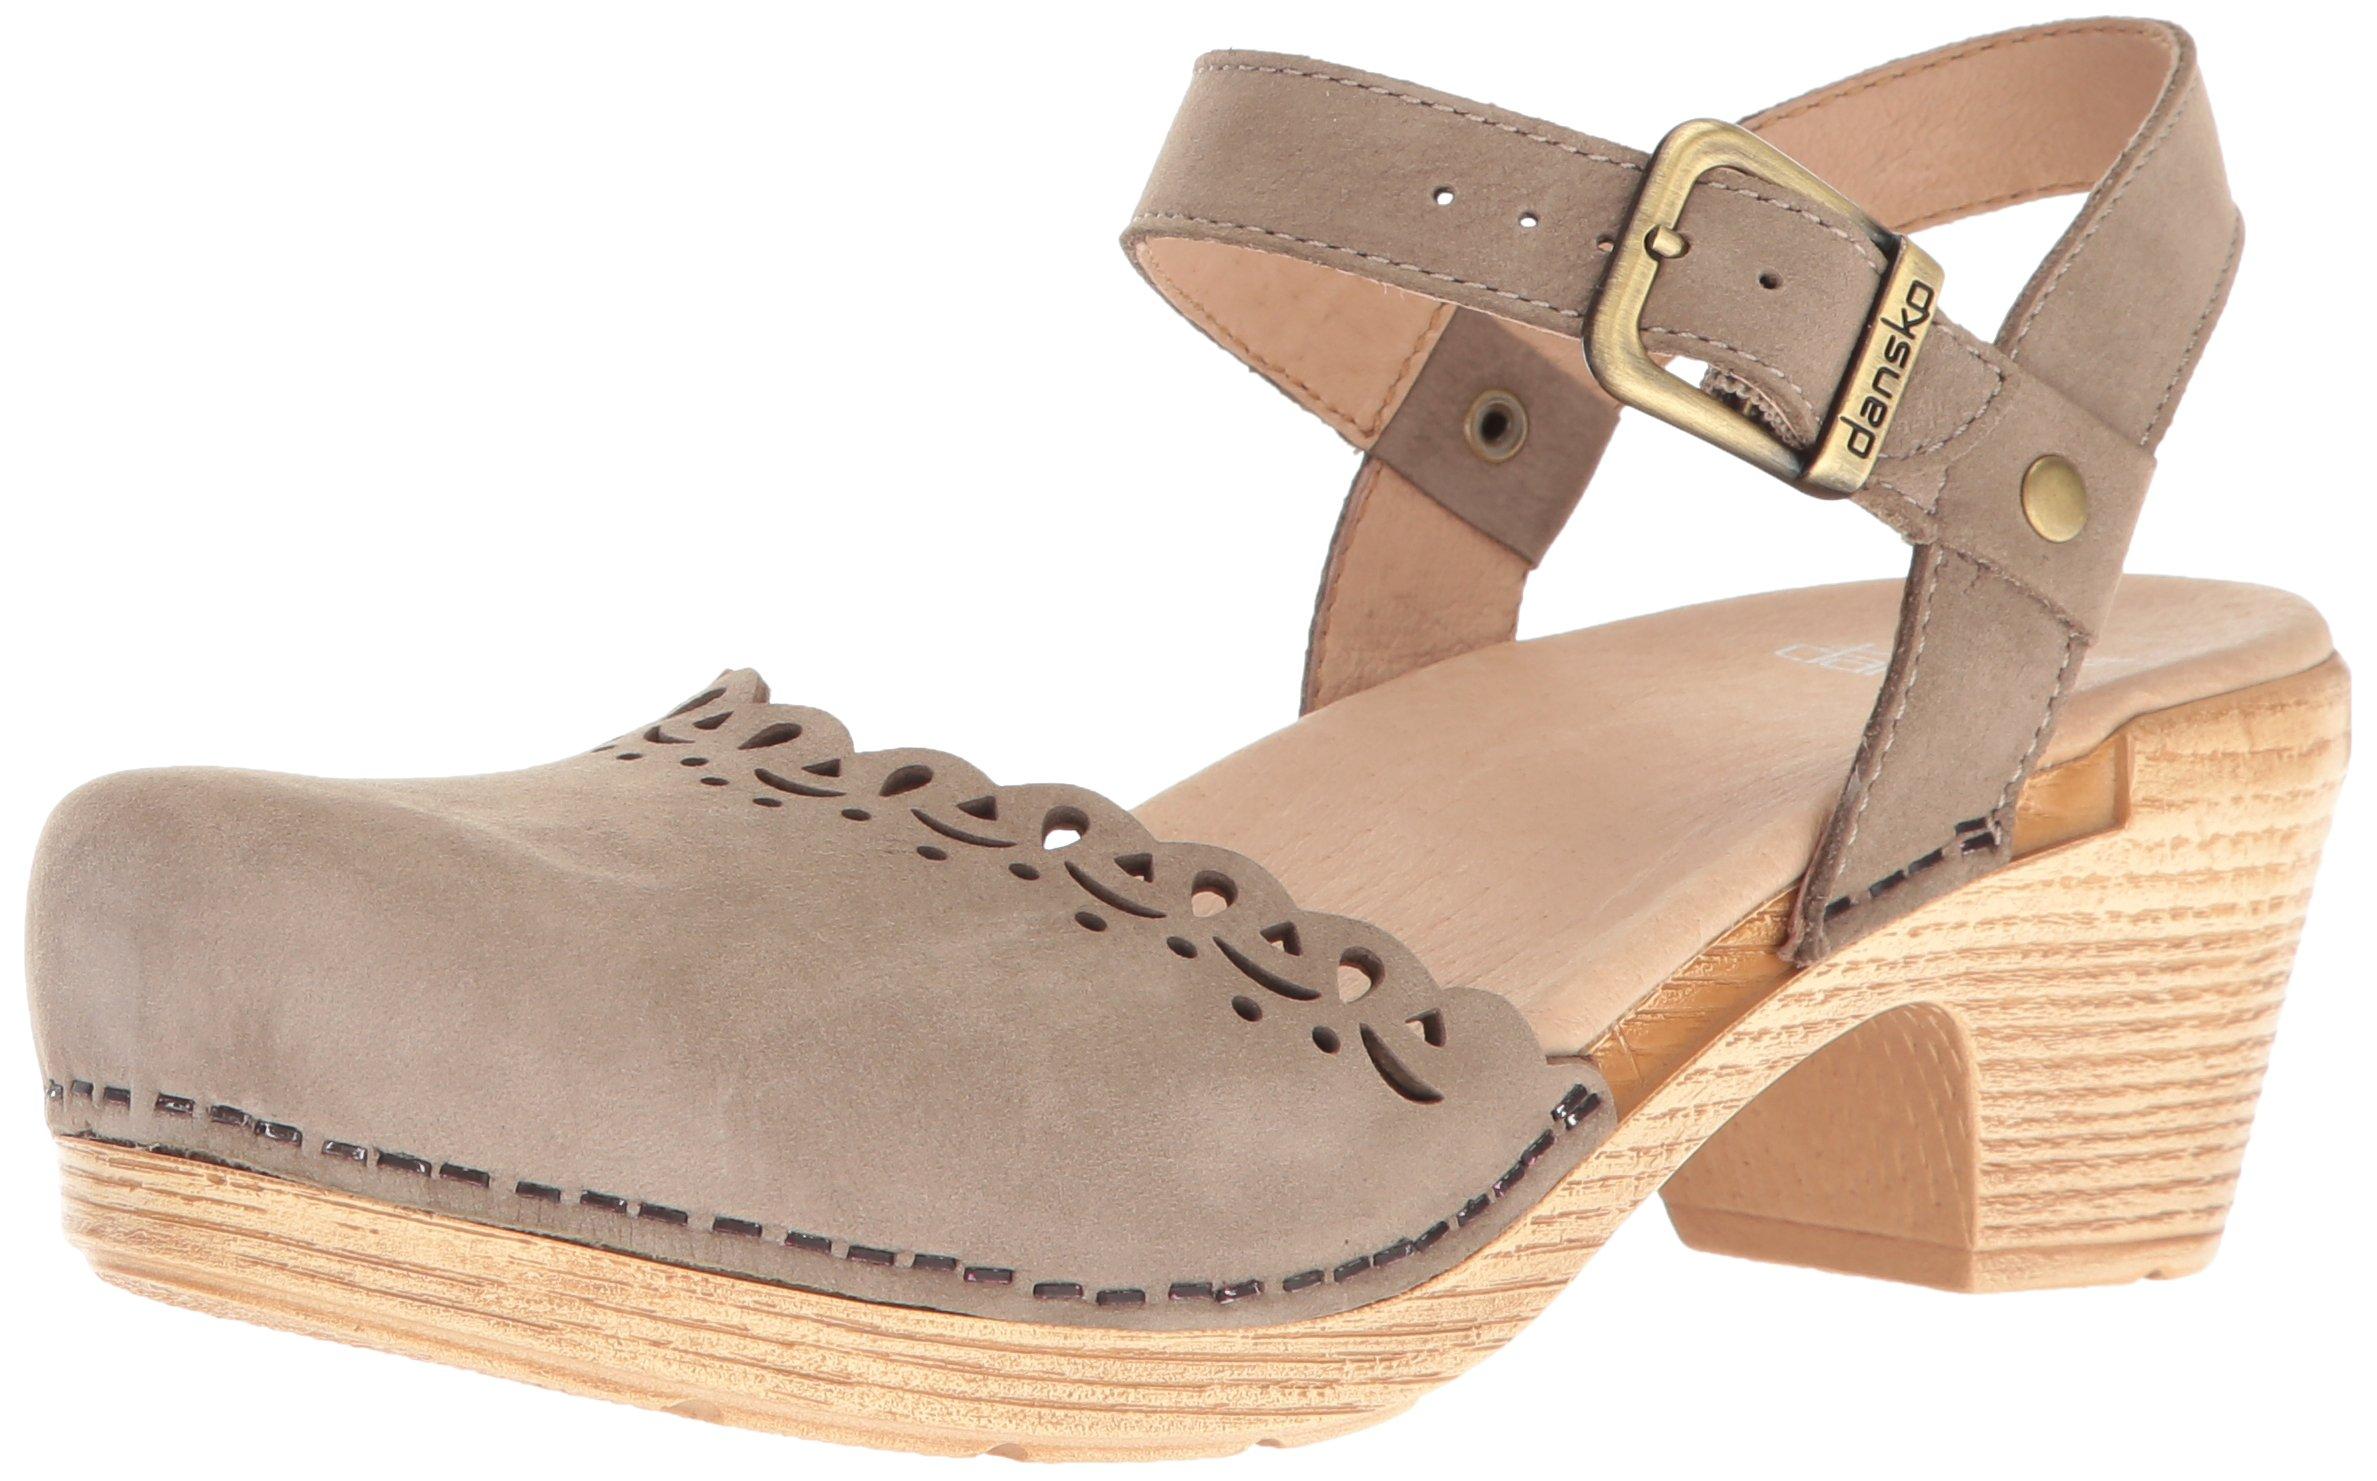 Dansko Women's Marta Flat Sandal, Taupe Milled Nubuck, 39 EU/8.5-9 M US